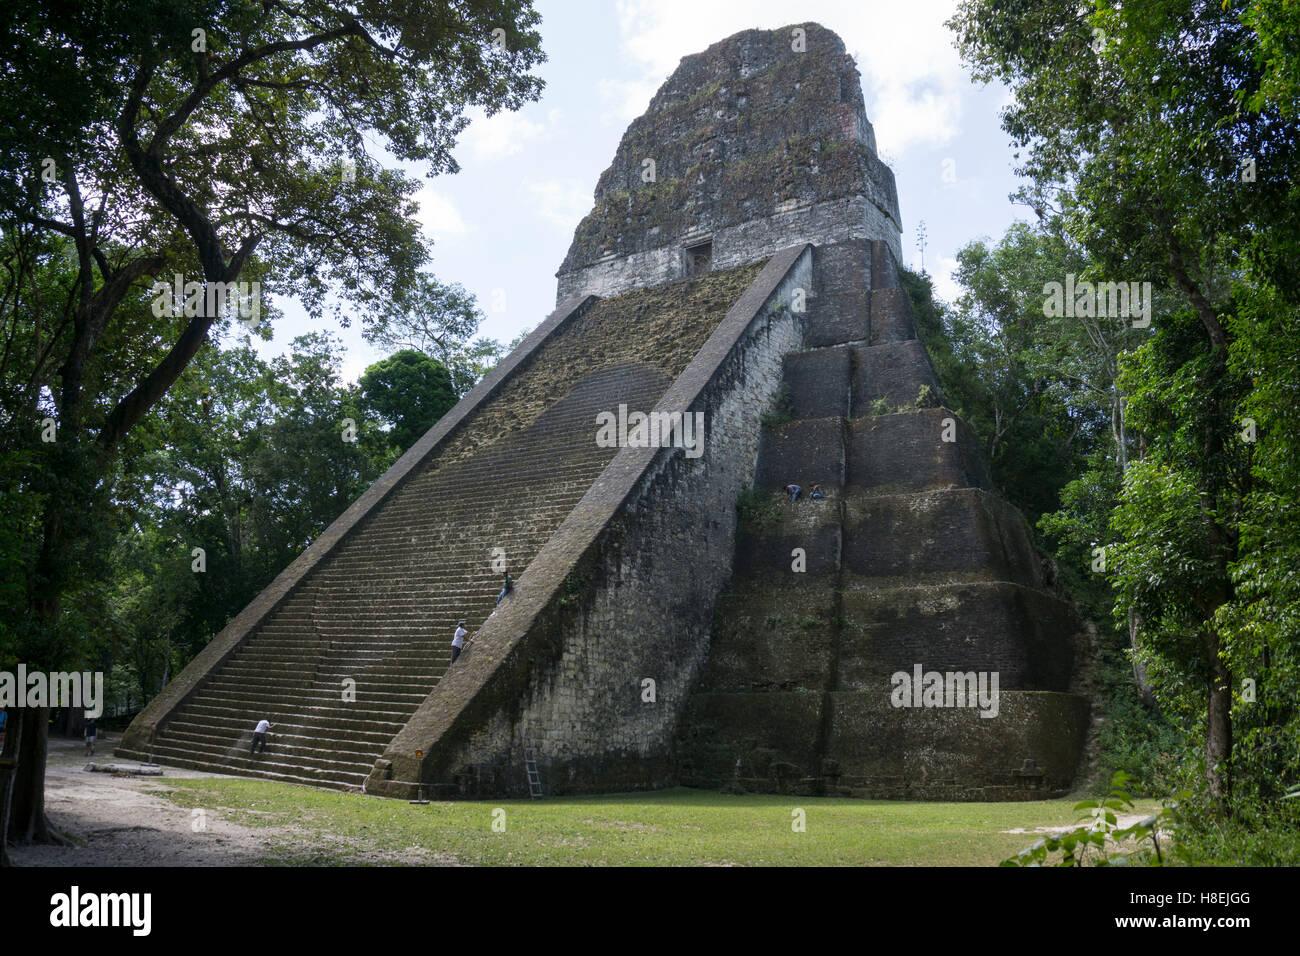 Tikal Temple 5, pre-Colombian Maya civilisation, Tikal, UNESCO World Heritage Site, Guatemala, Central America - Stock Image